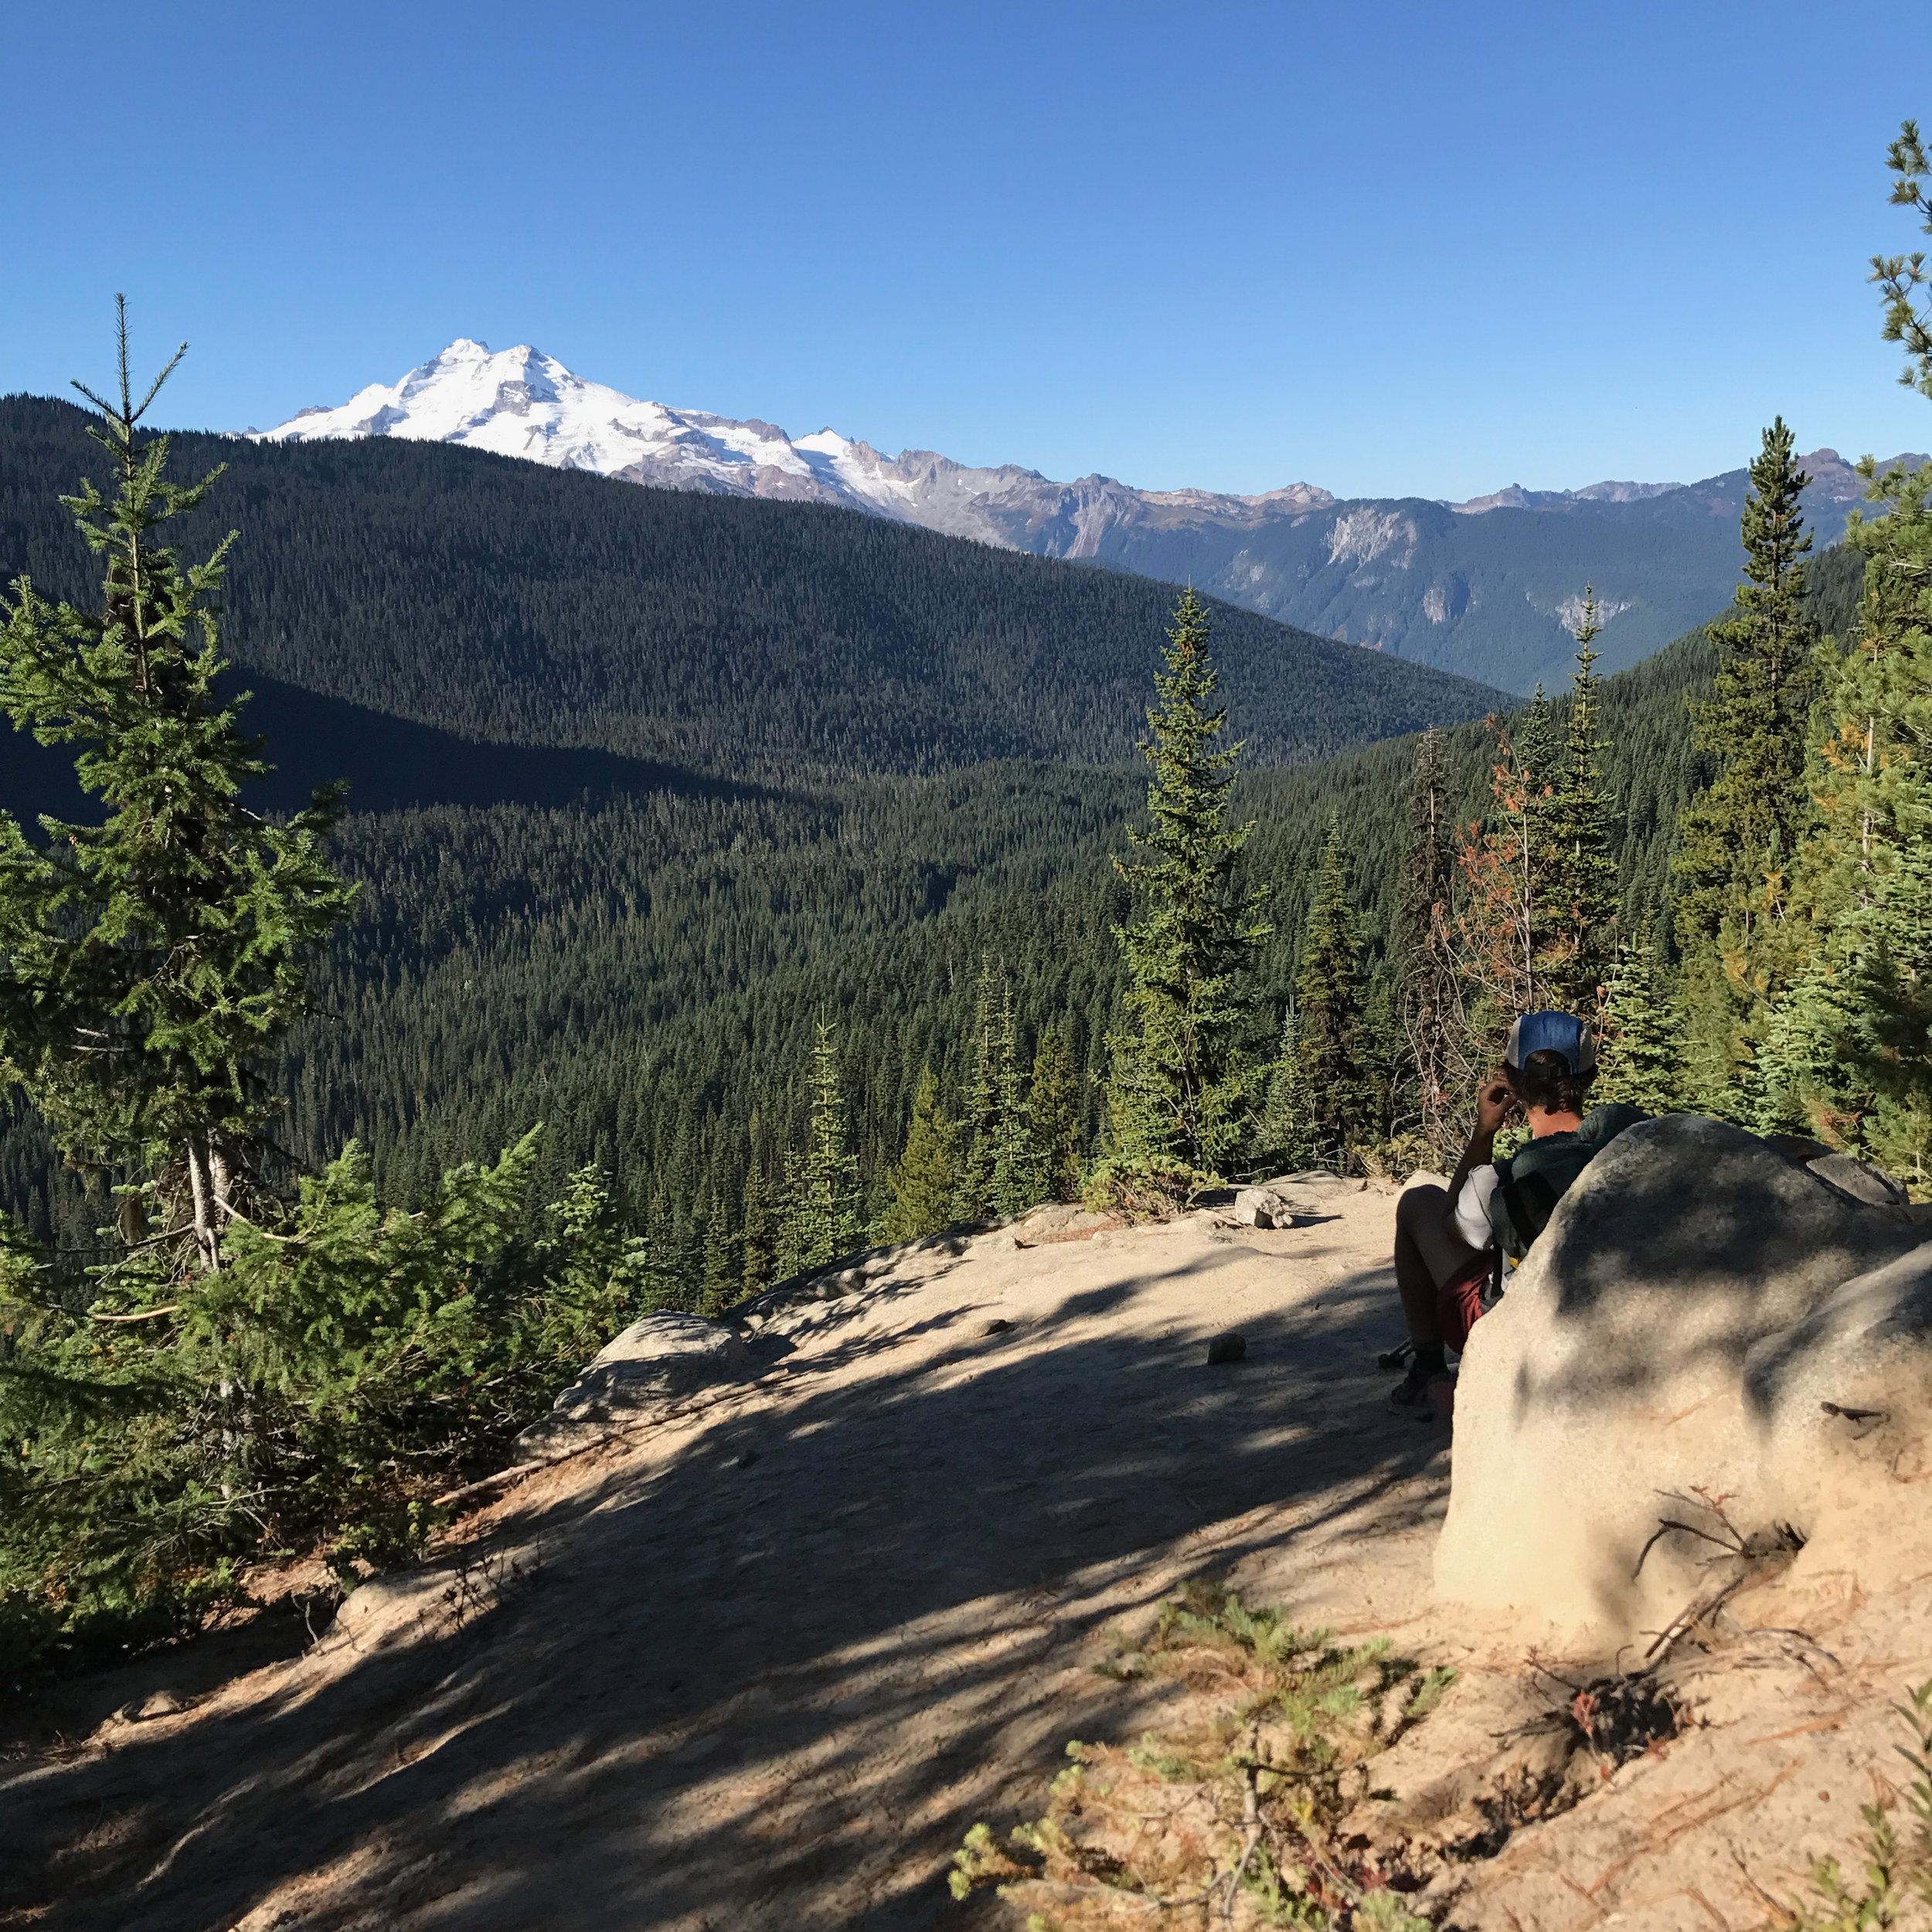 Taking in Glacier Peak one last time before leaving its wilderness